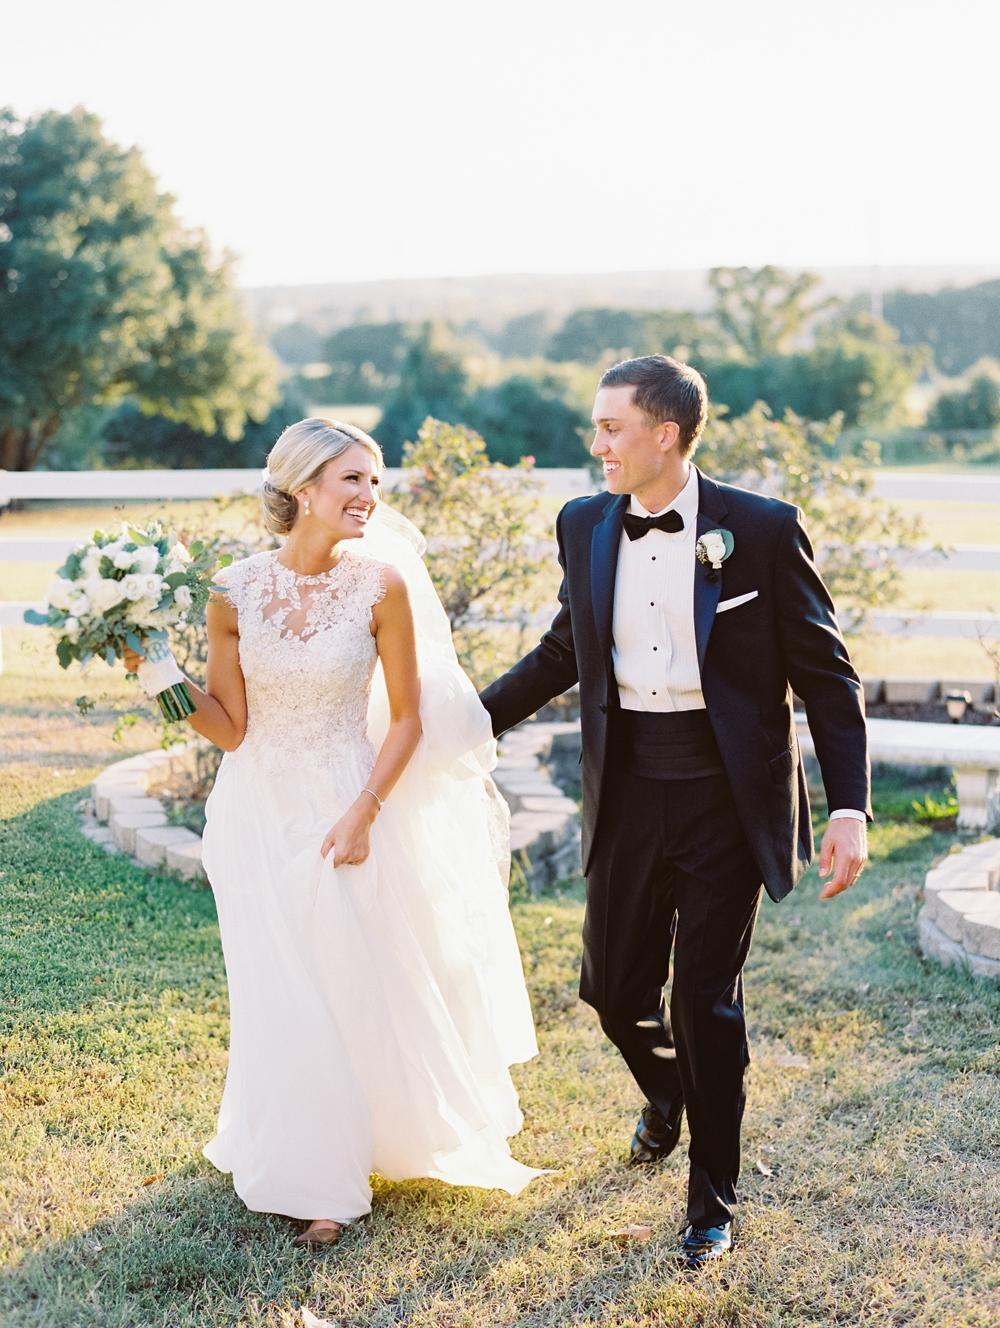 Megan & Corbin - Lonestar Mansion | Burleson, TXVendors: Venue: Lonestar Mansion | Planning: Cardinal & Co Events | Florals: Lilium Florals | Hair & Makeup: The Styling Stewardess